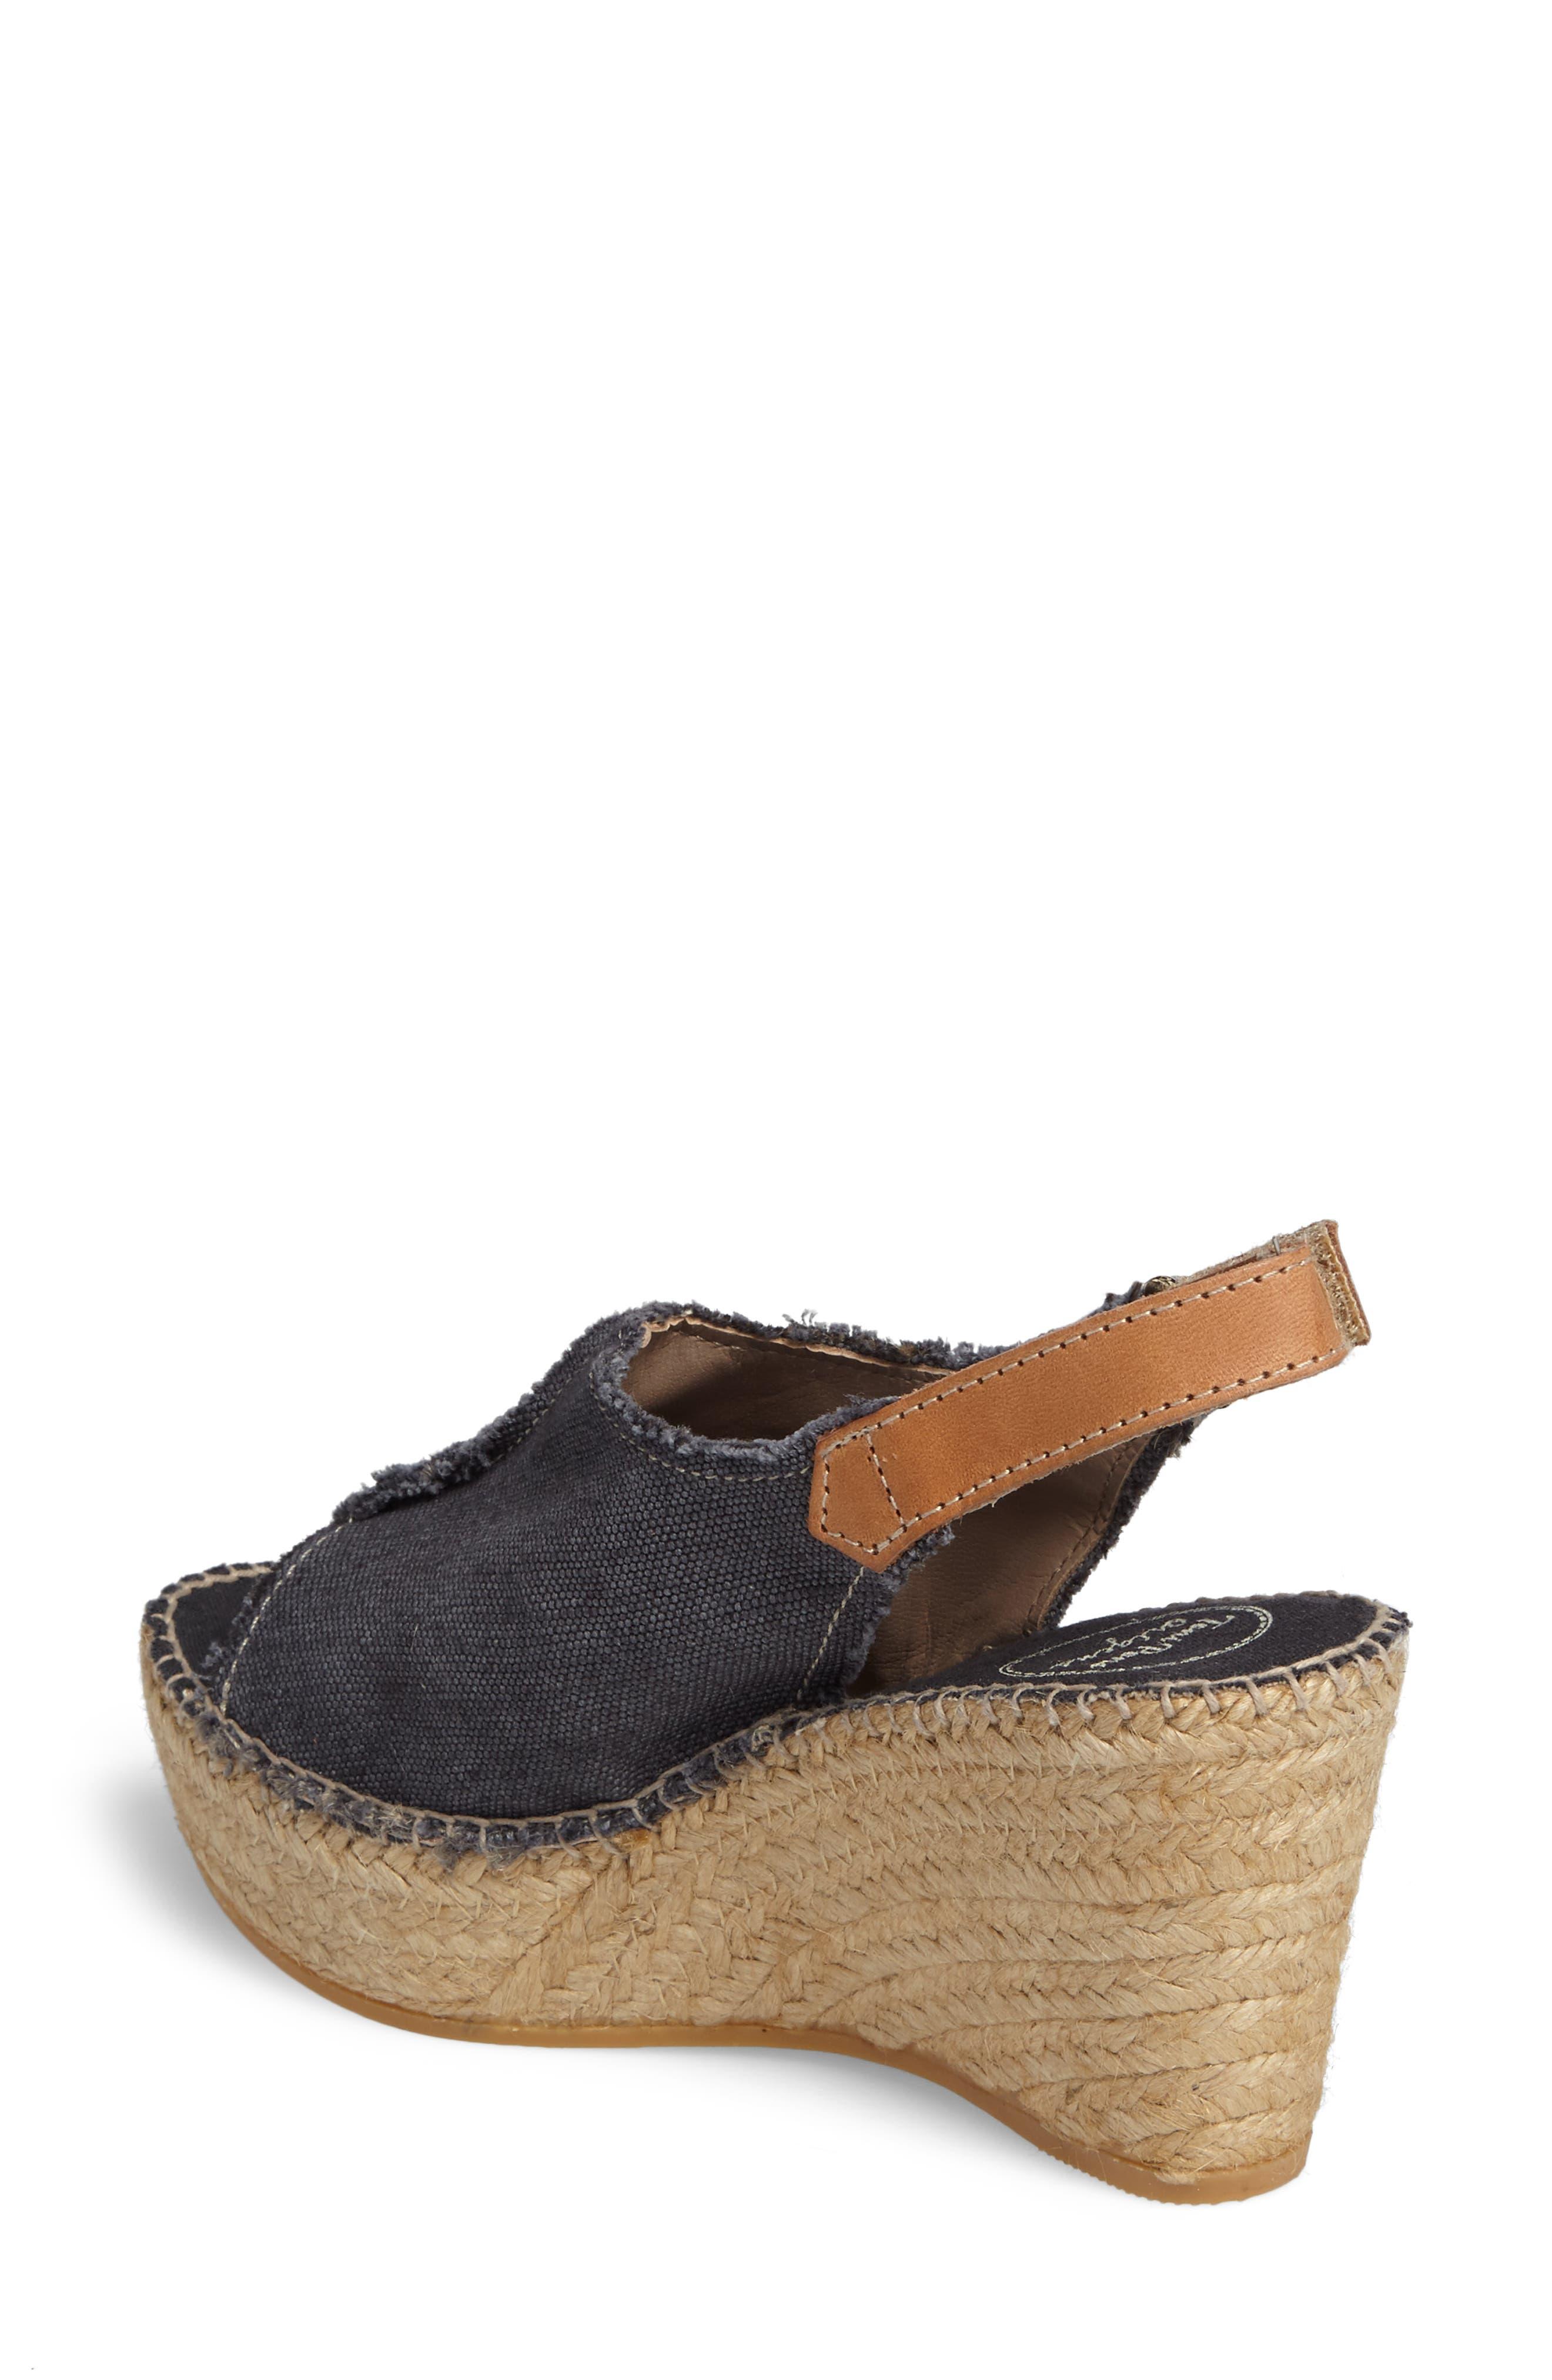 'Lugano' Espadrille Wedge Sandal,                             Alternate thumbnail 2, color,                             BLACK FABRIC